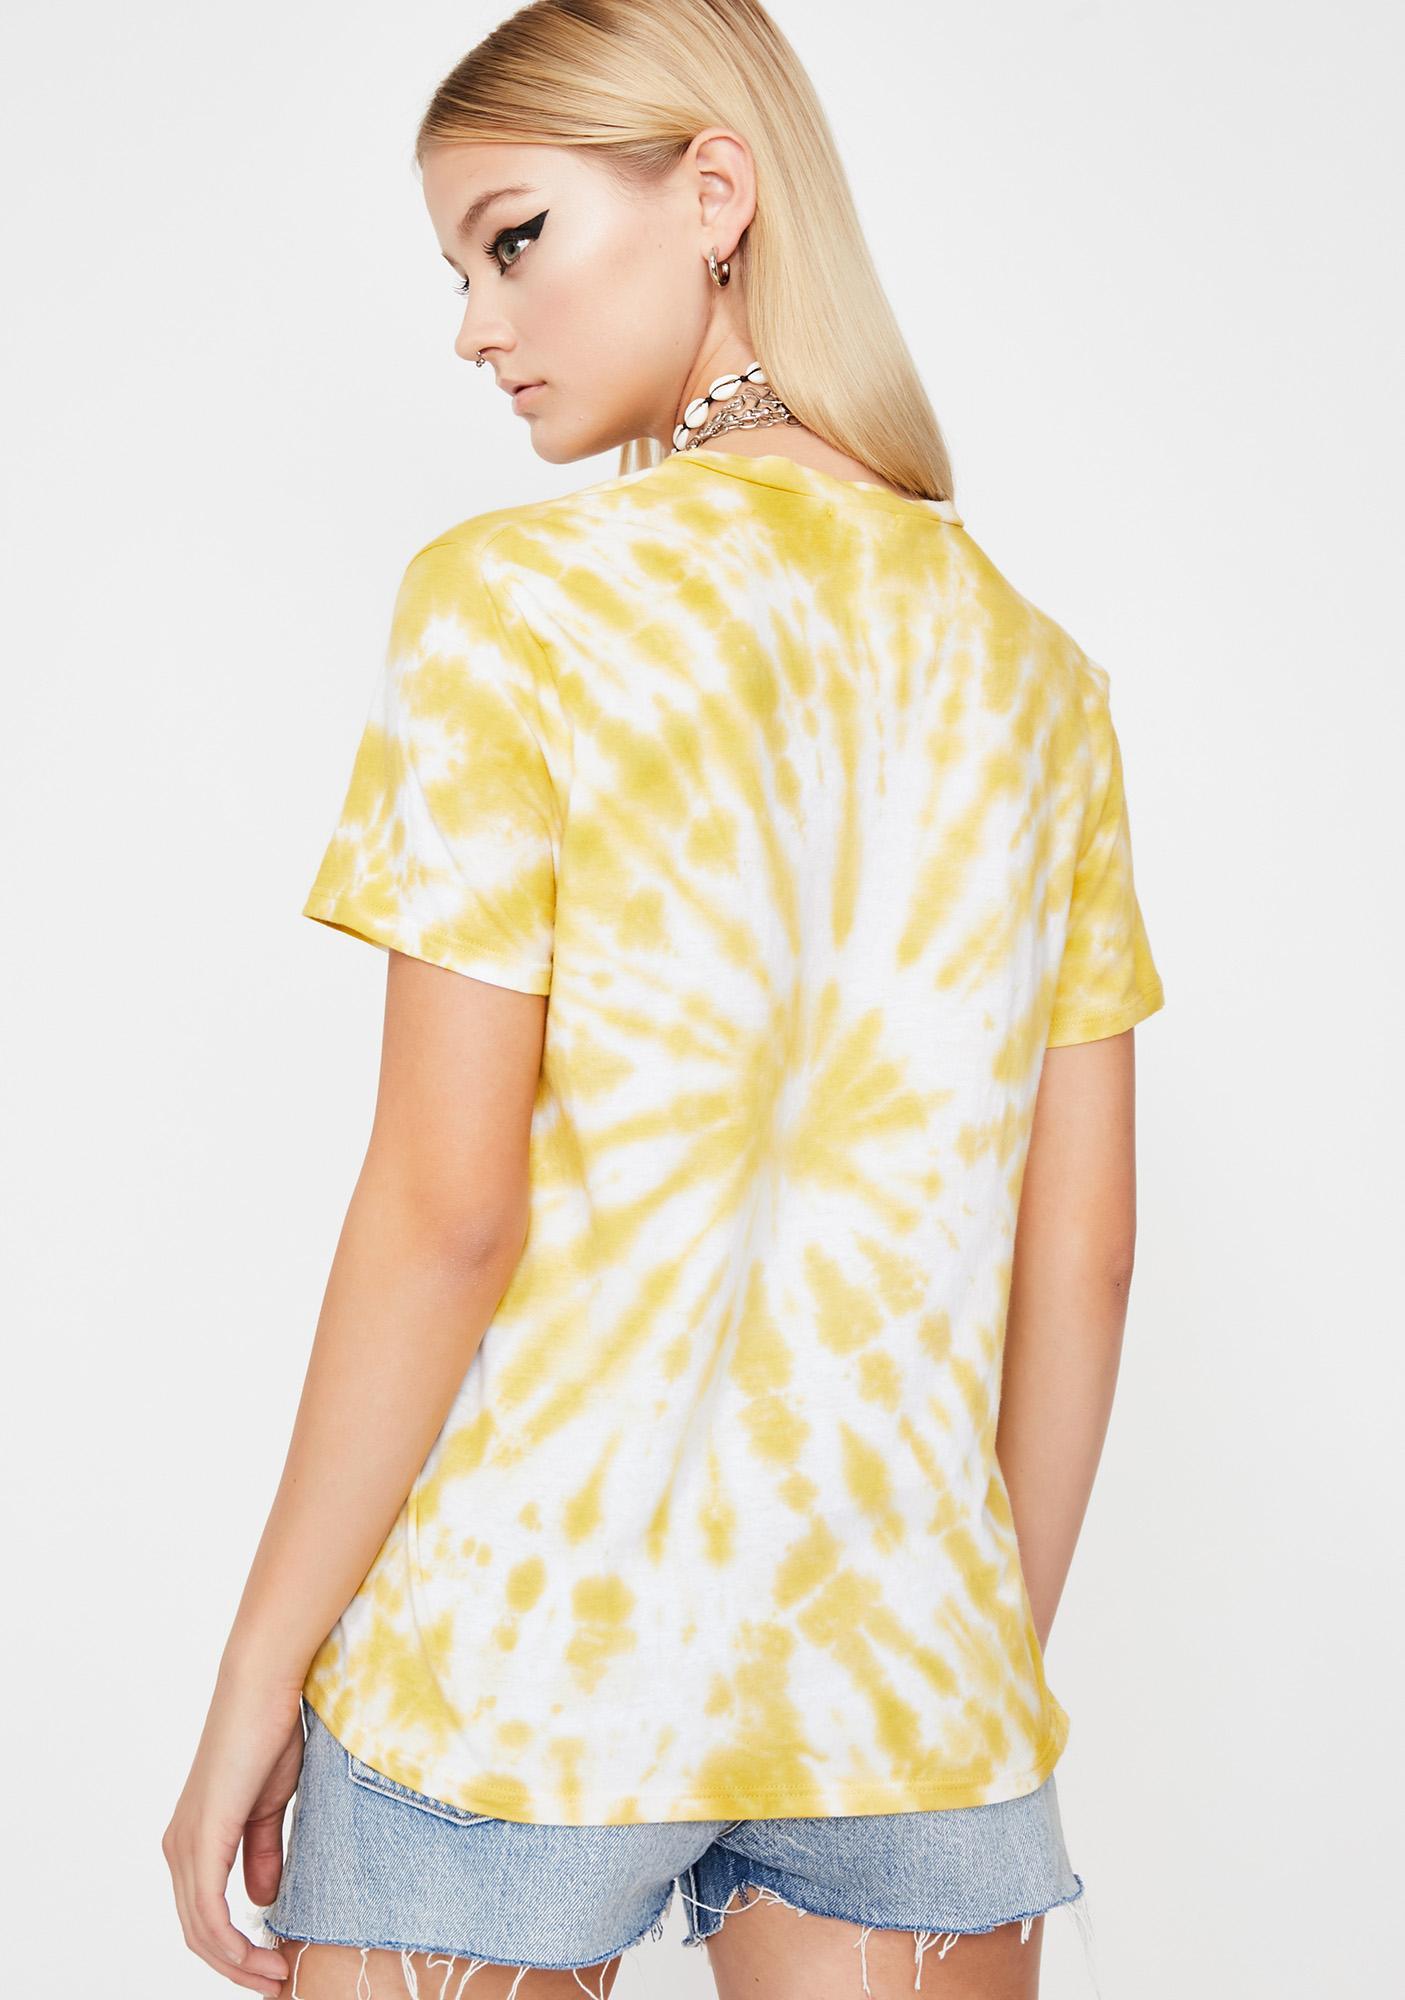 Sunny High Summer Tie-Dye Tee